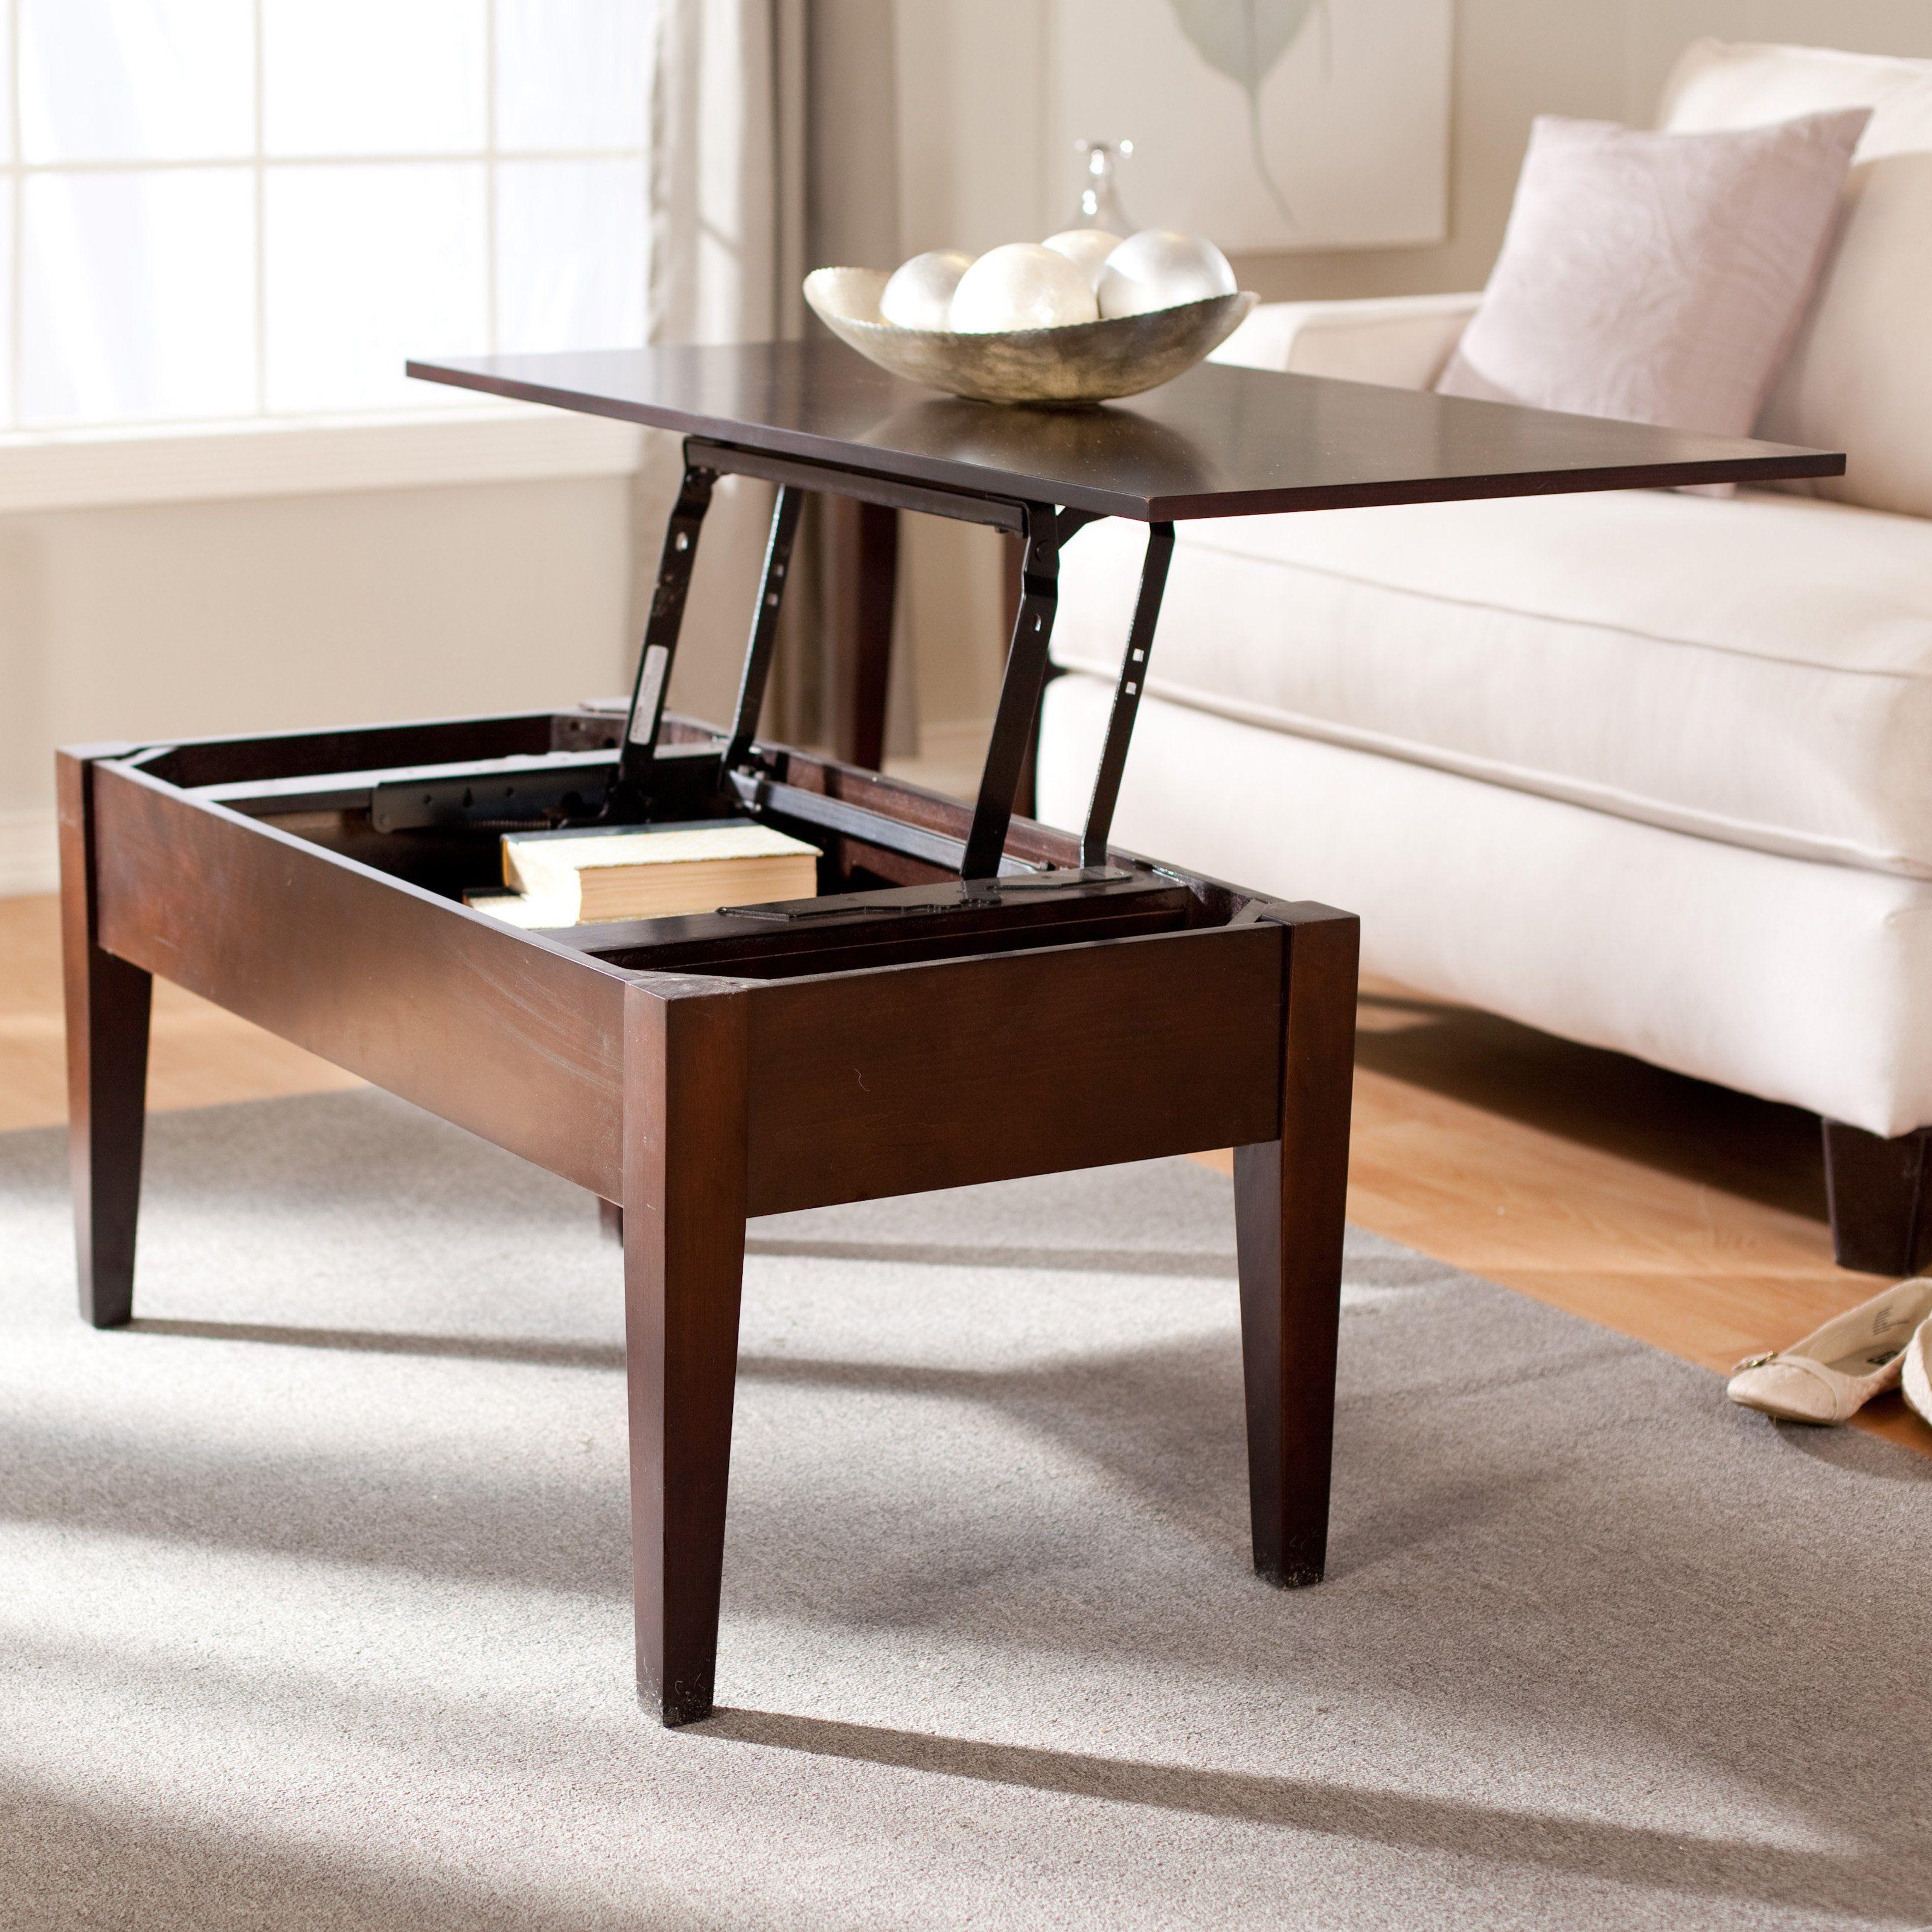 Buy Turner Lift Top Coffee Table Espresso Dimensions 40W x 22D x